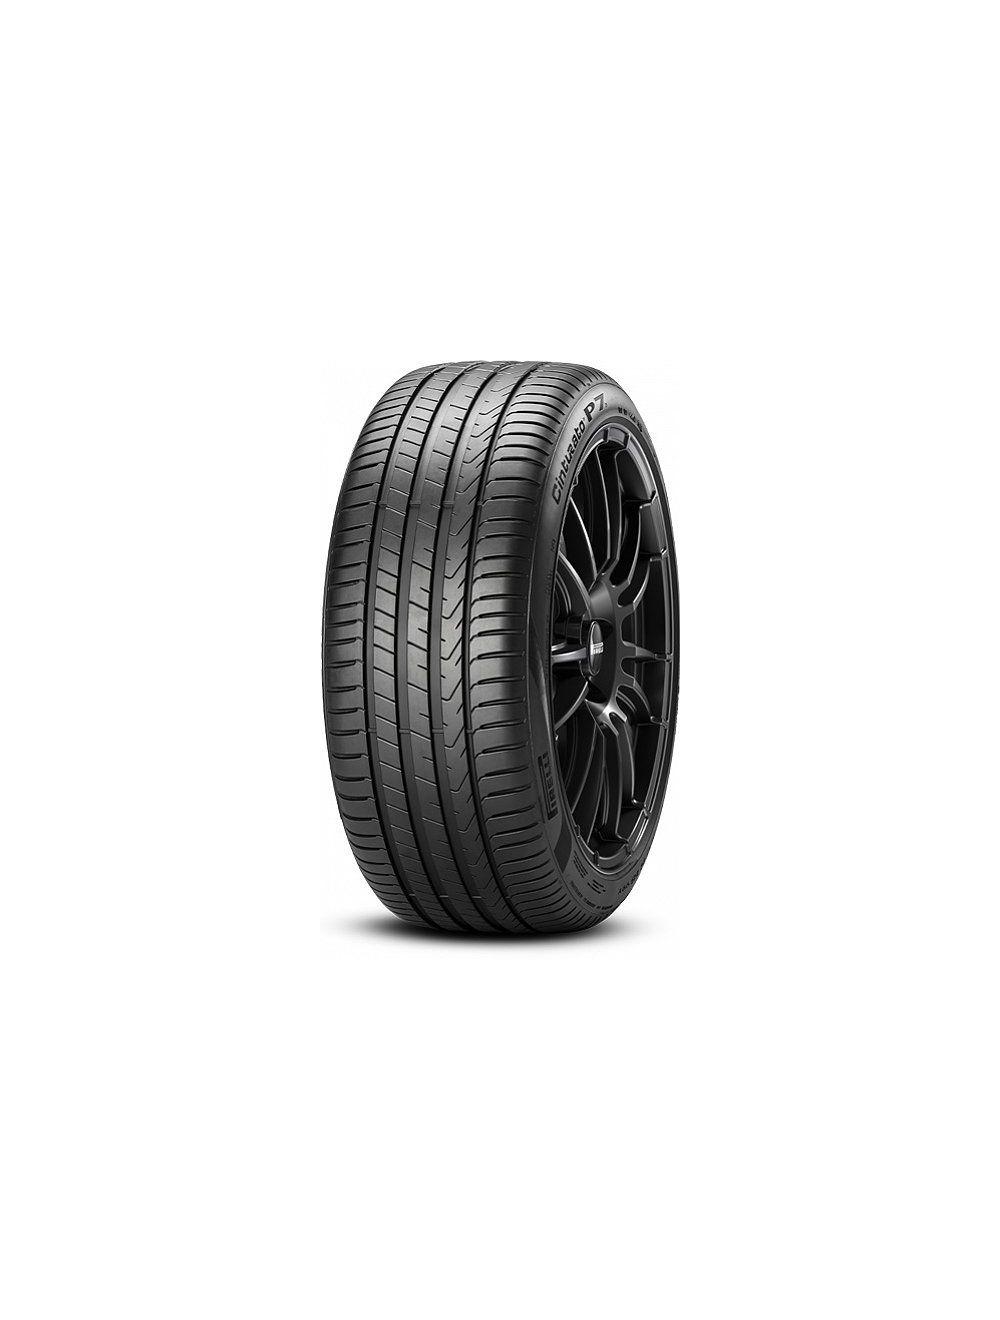 Pirelli 245/45R18 Y P7-2 Cinturato XL MO Nyári gumi